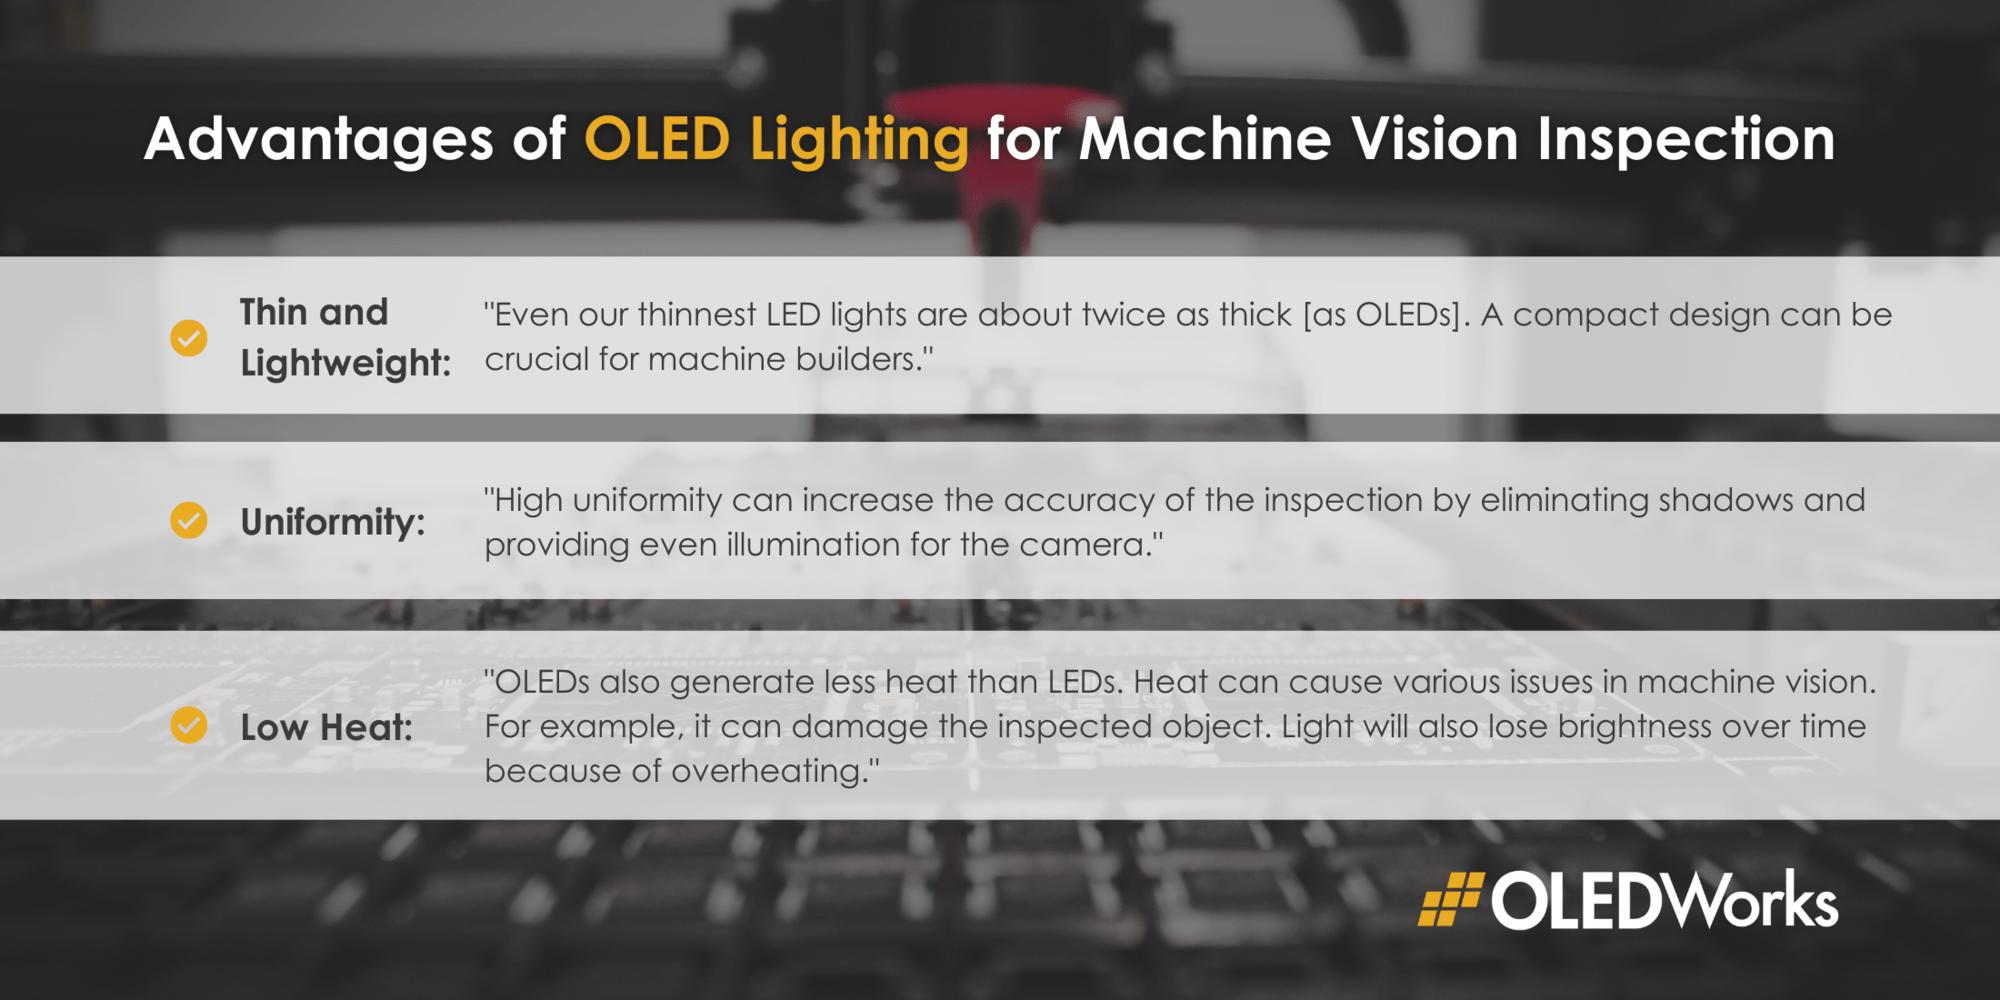 OLED lighting benefits for machine vision